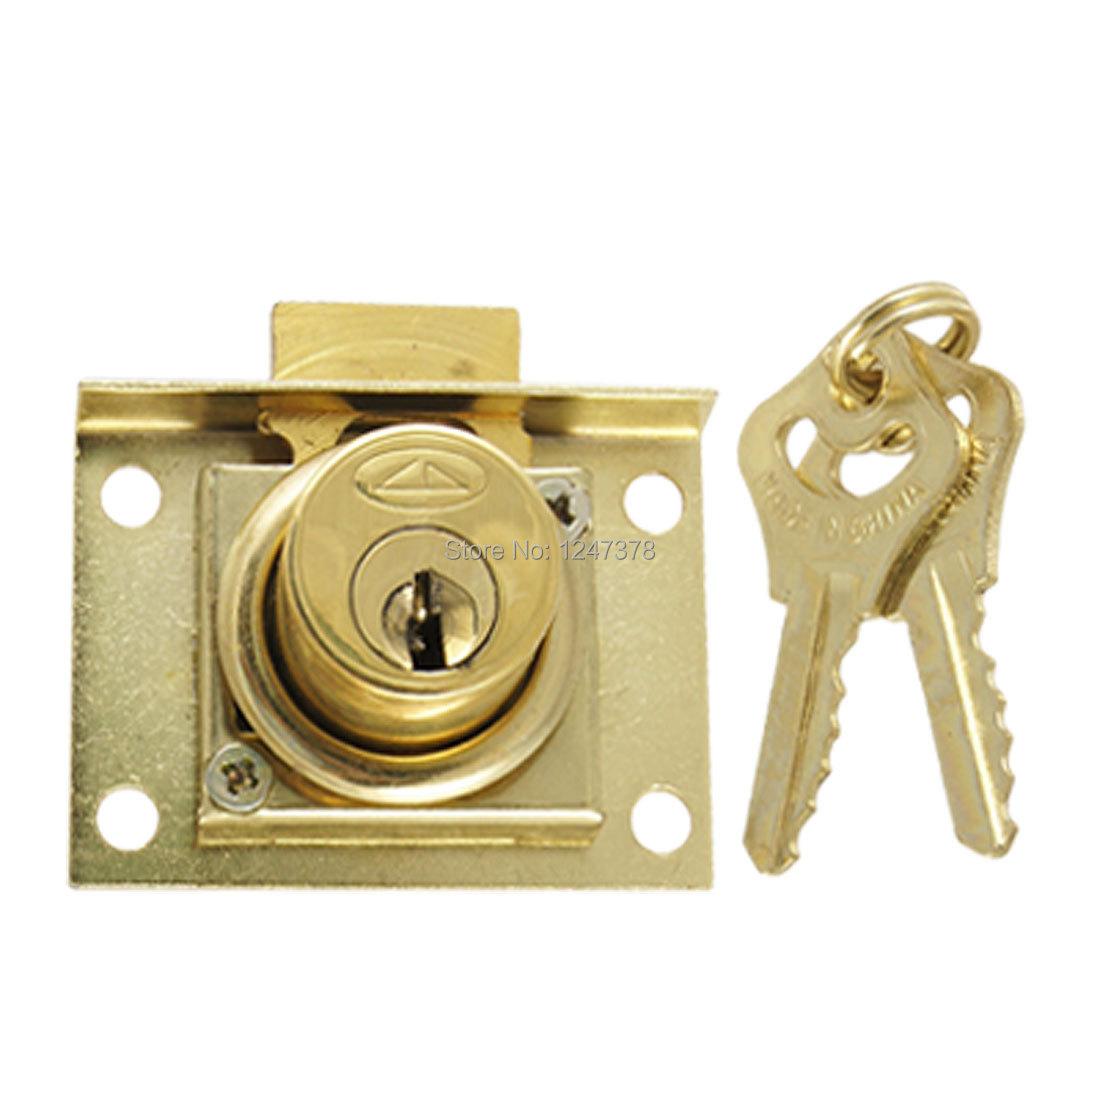 Quarter Turn Drawer 4 5 Diameter Cylinder Lock w Keys Discount 50 Tool